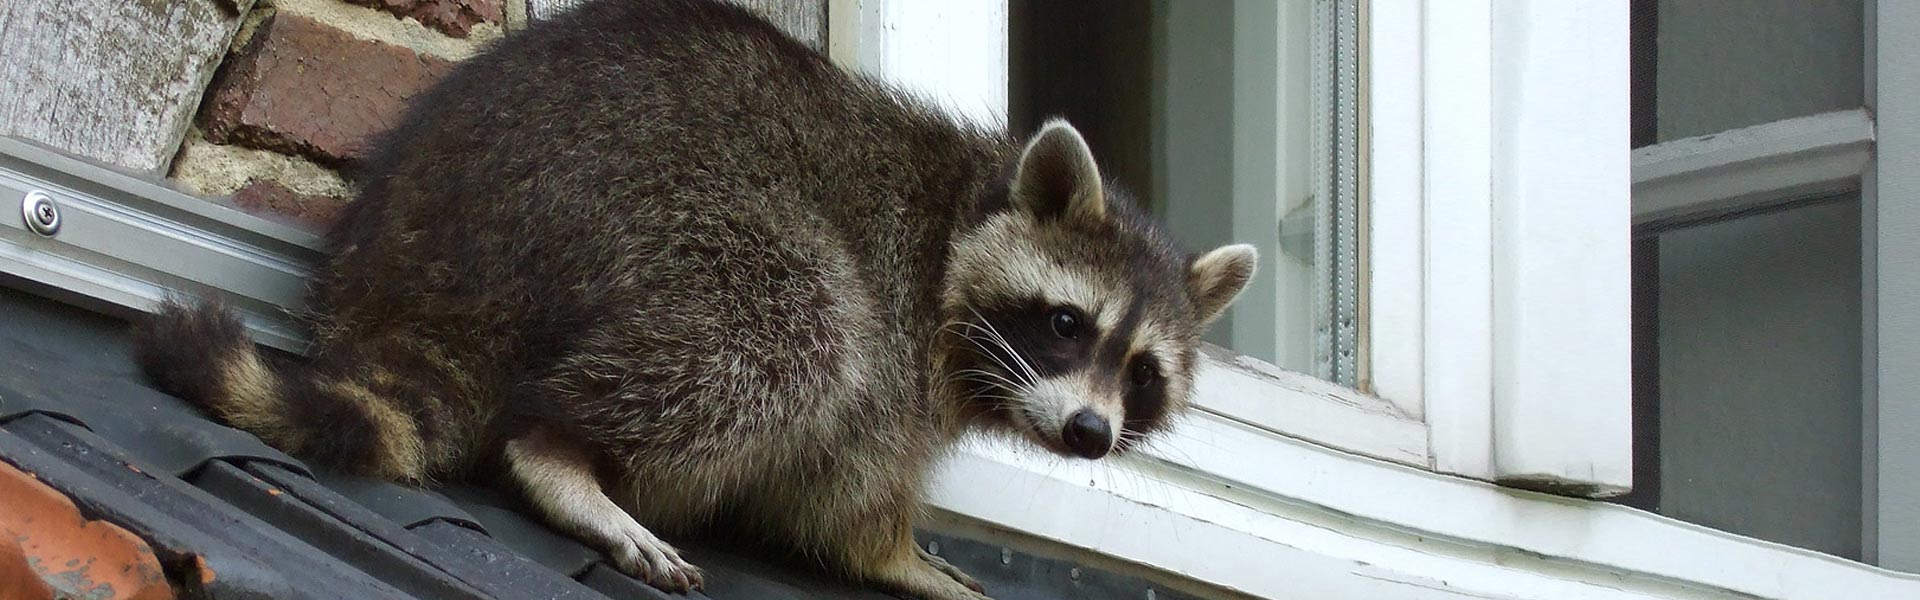 Macomb County Raccoon Control